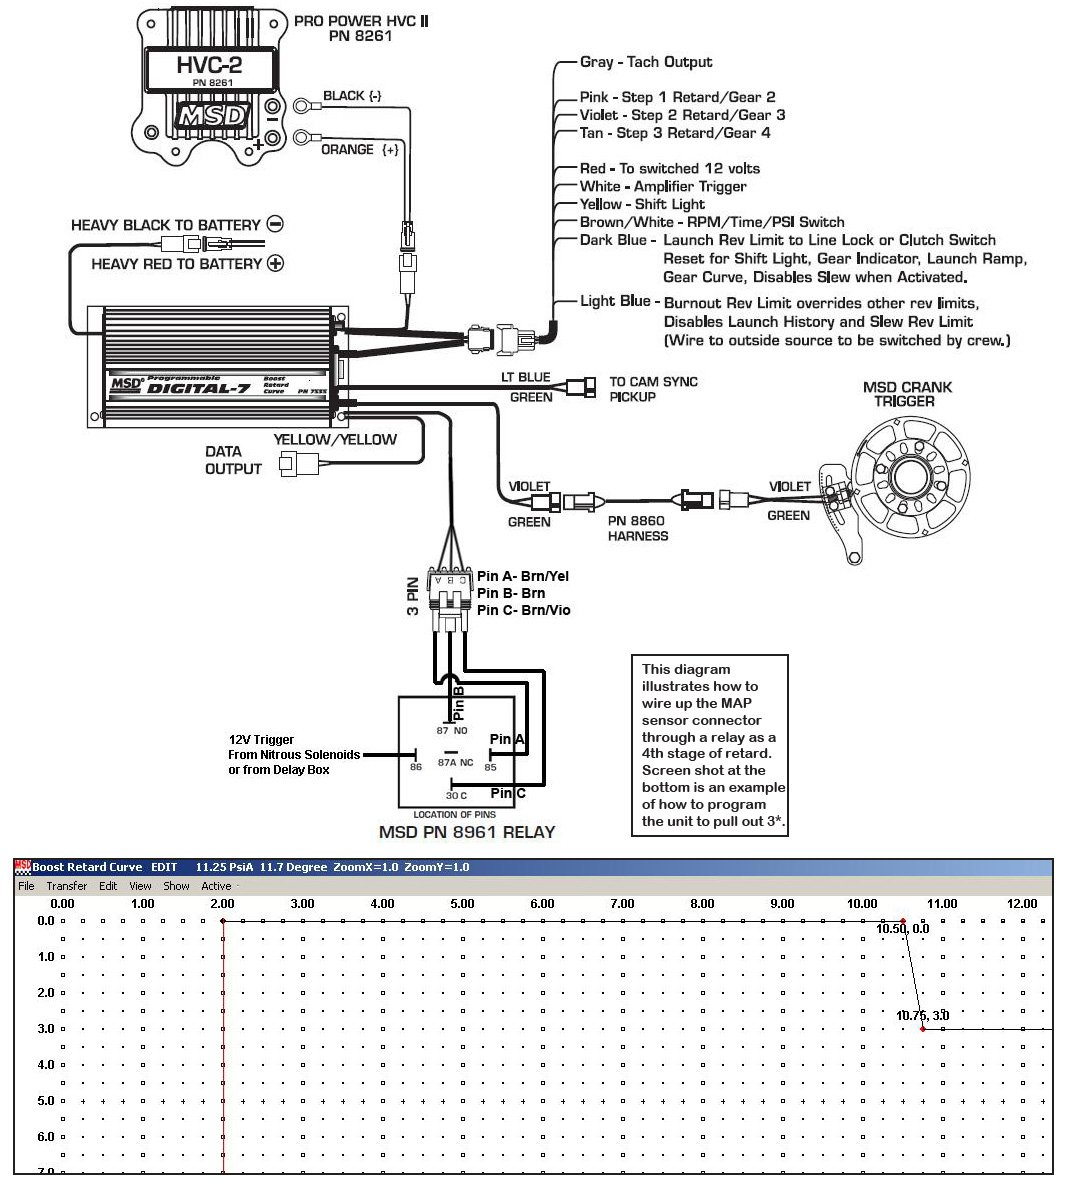 7320 msd ignition wiring diagram wiring diagram progresif msd 8360 wiring diagram 7320 msd ignition wiring diagram [ 1065 x 1182 Pixel ]